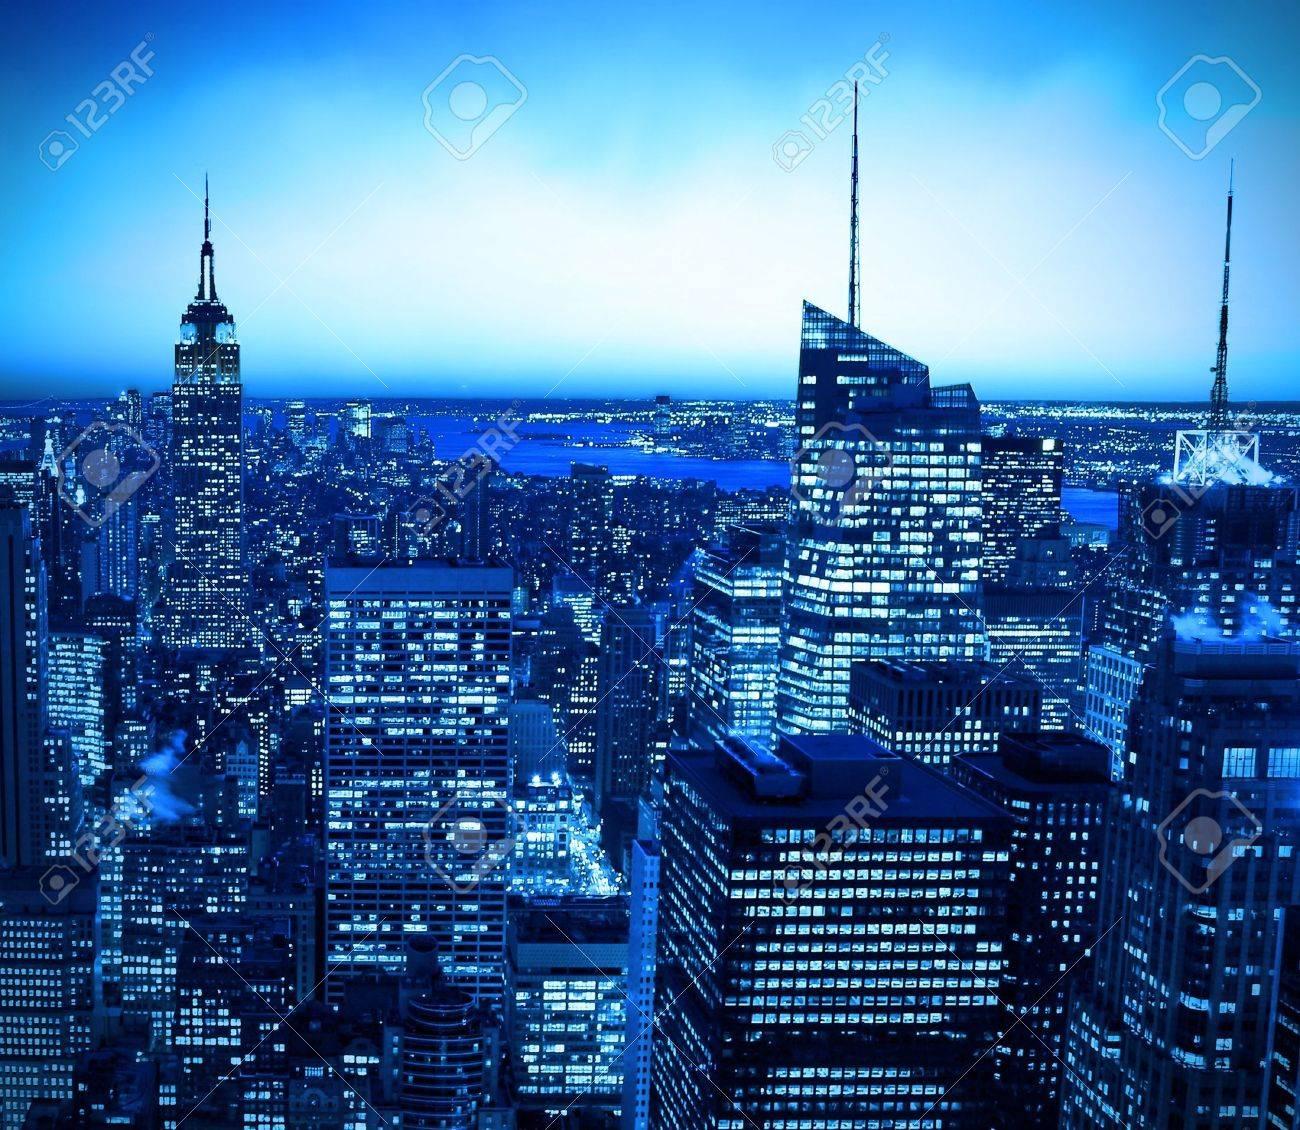 New York City skyline at night with blue hue Stock Photo - 6199191